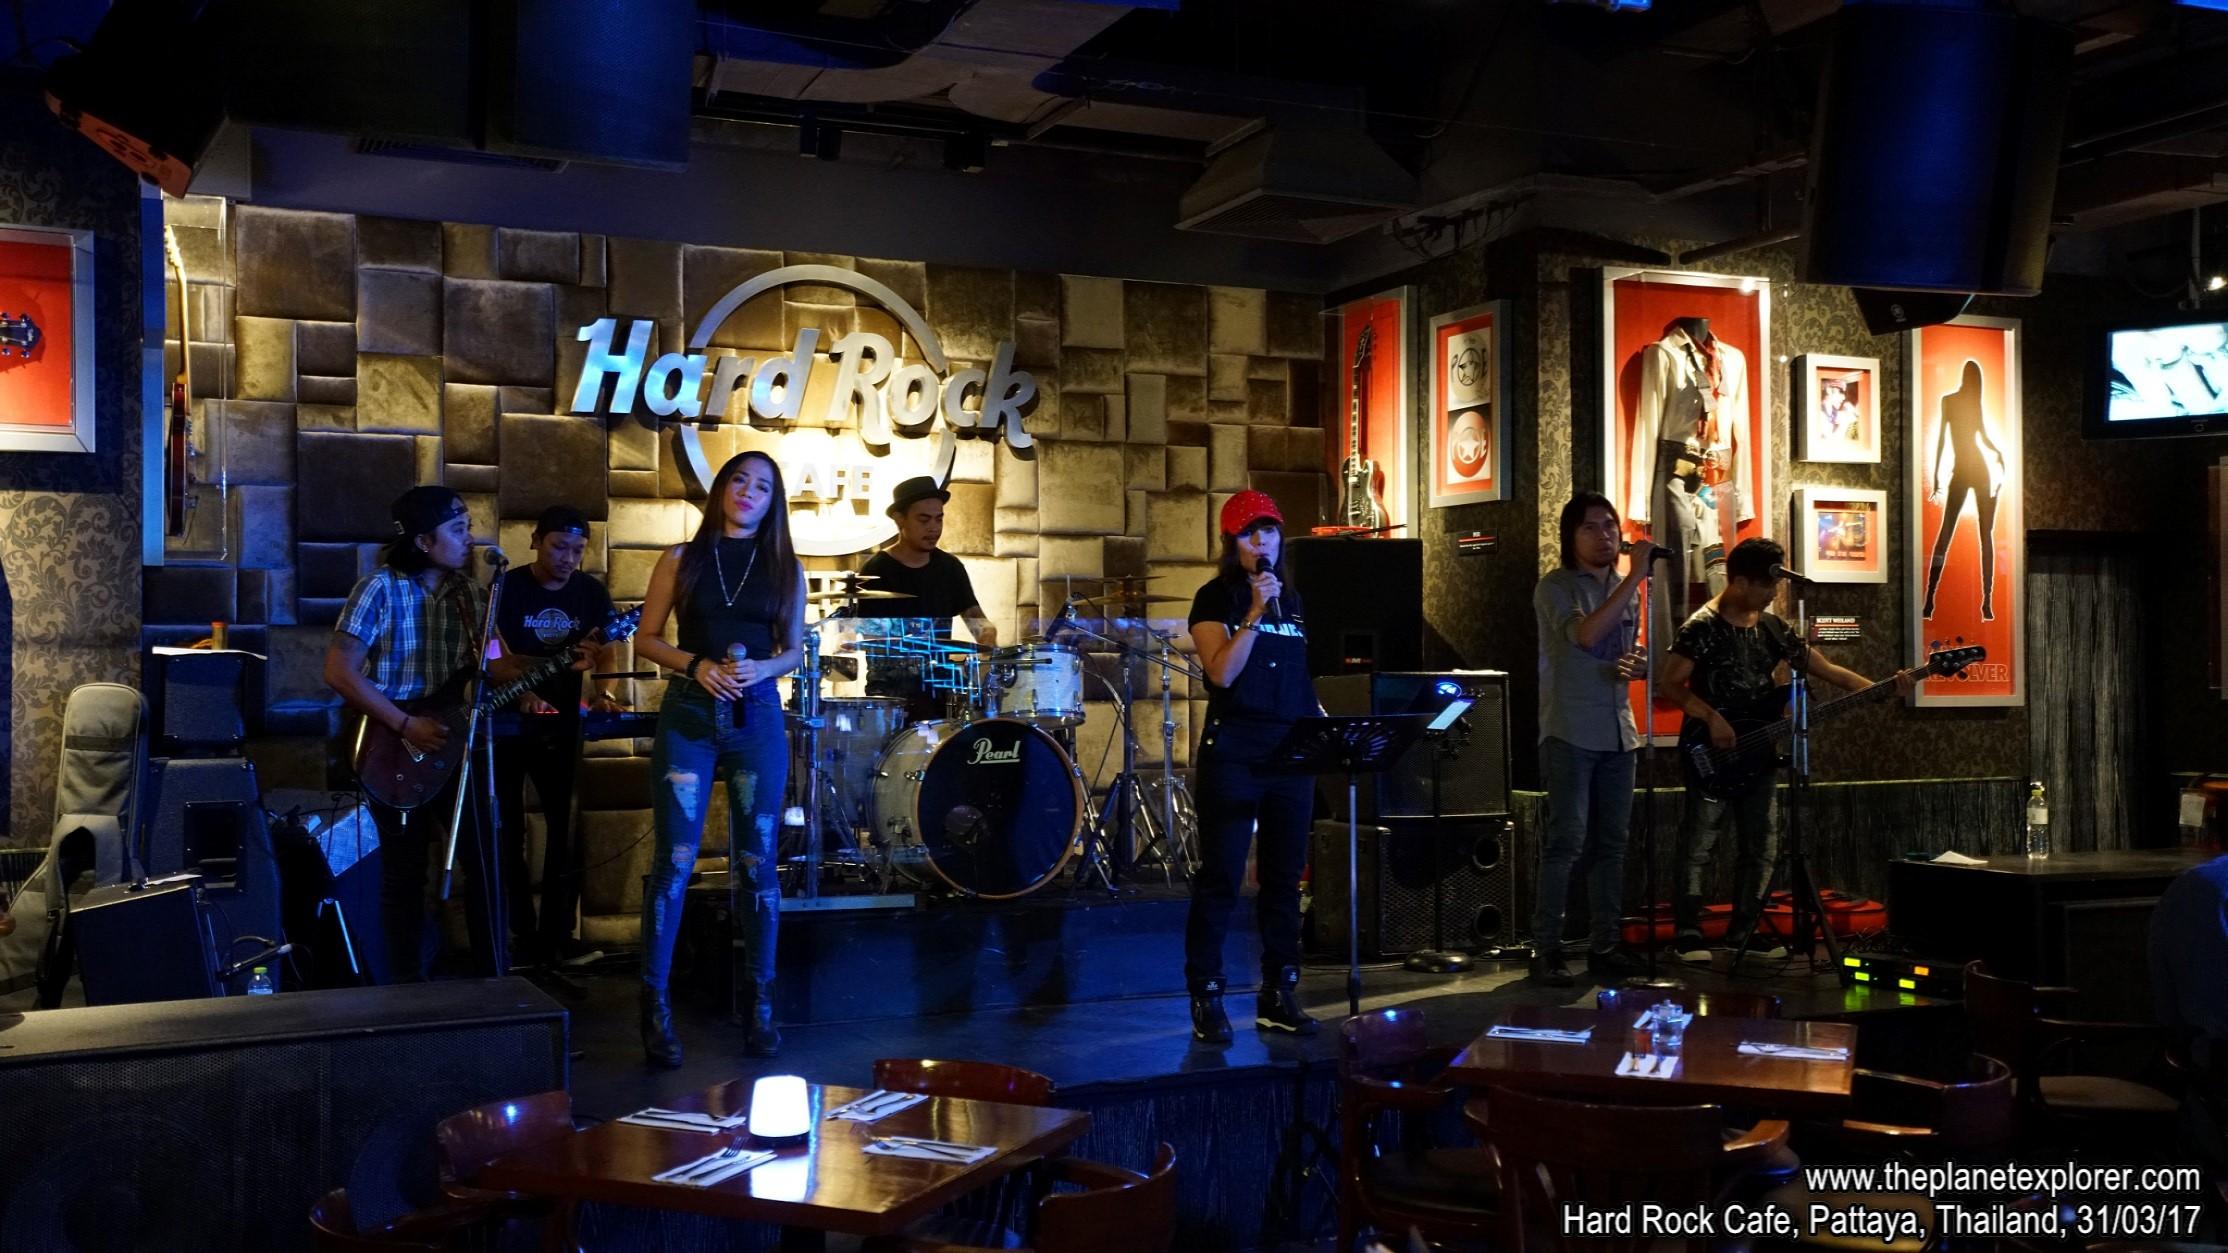 2017-03-31_2121_Thailand_Pattaya_Hard Rock Cafe Pattaya_DSC04126_s7R2_LR_@